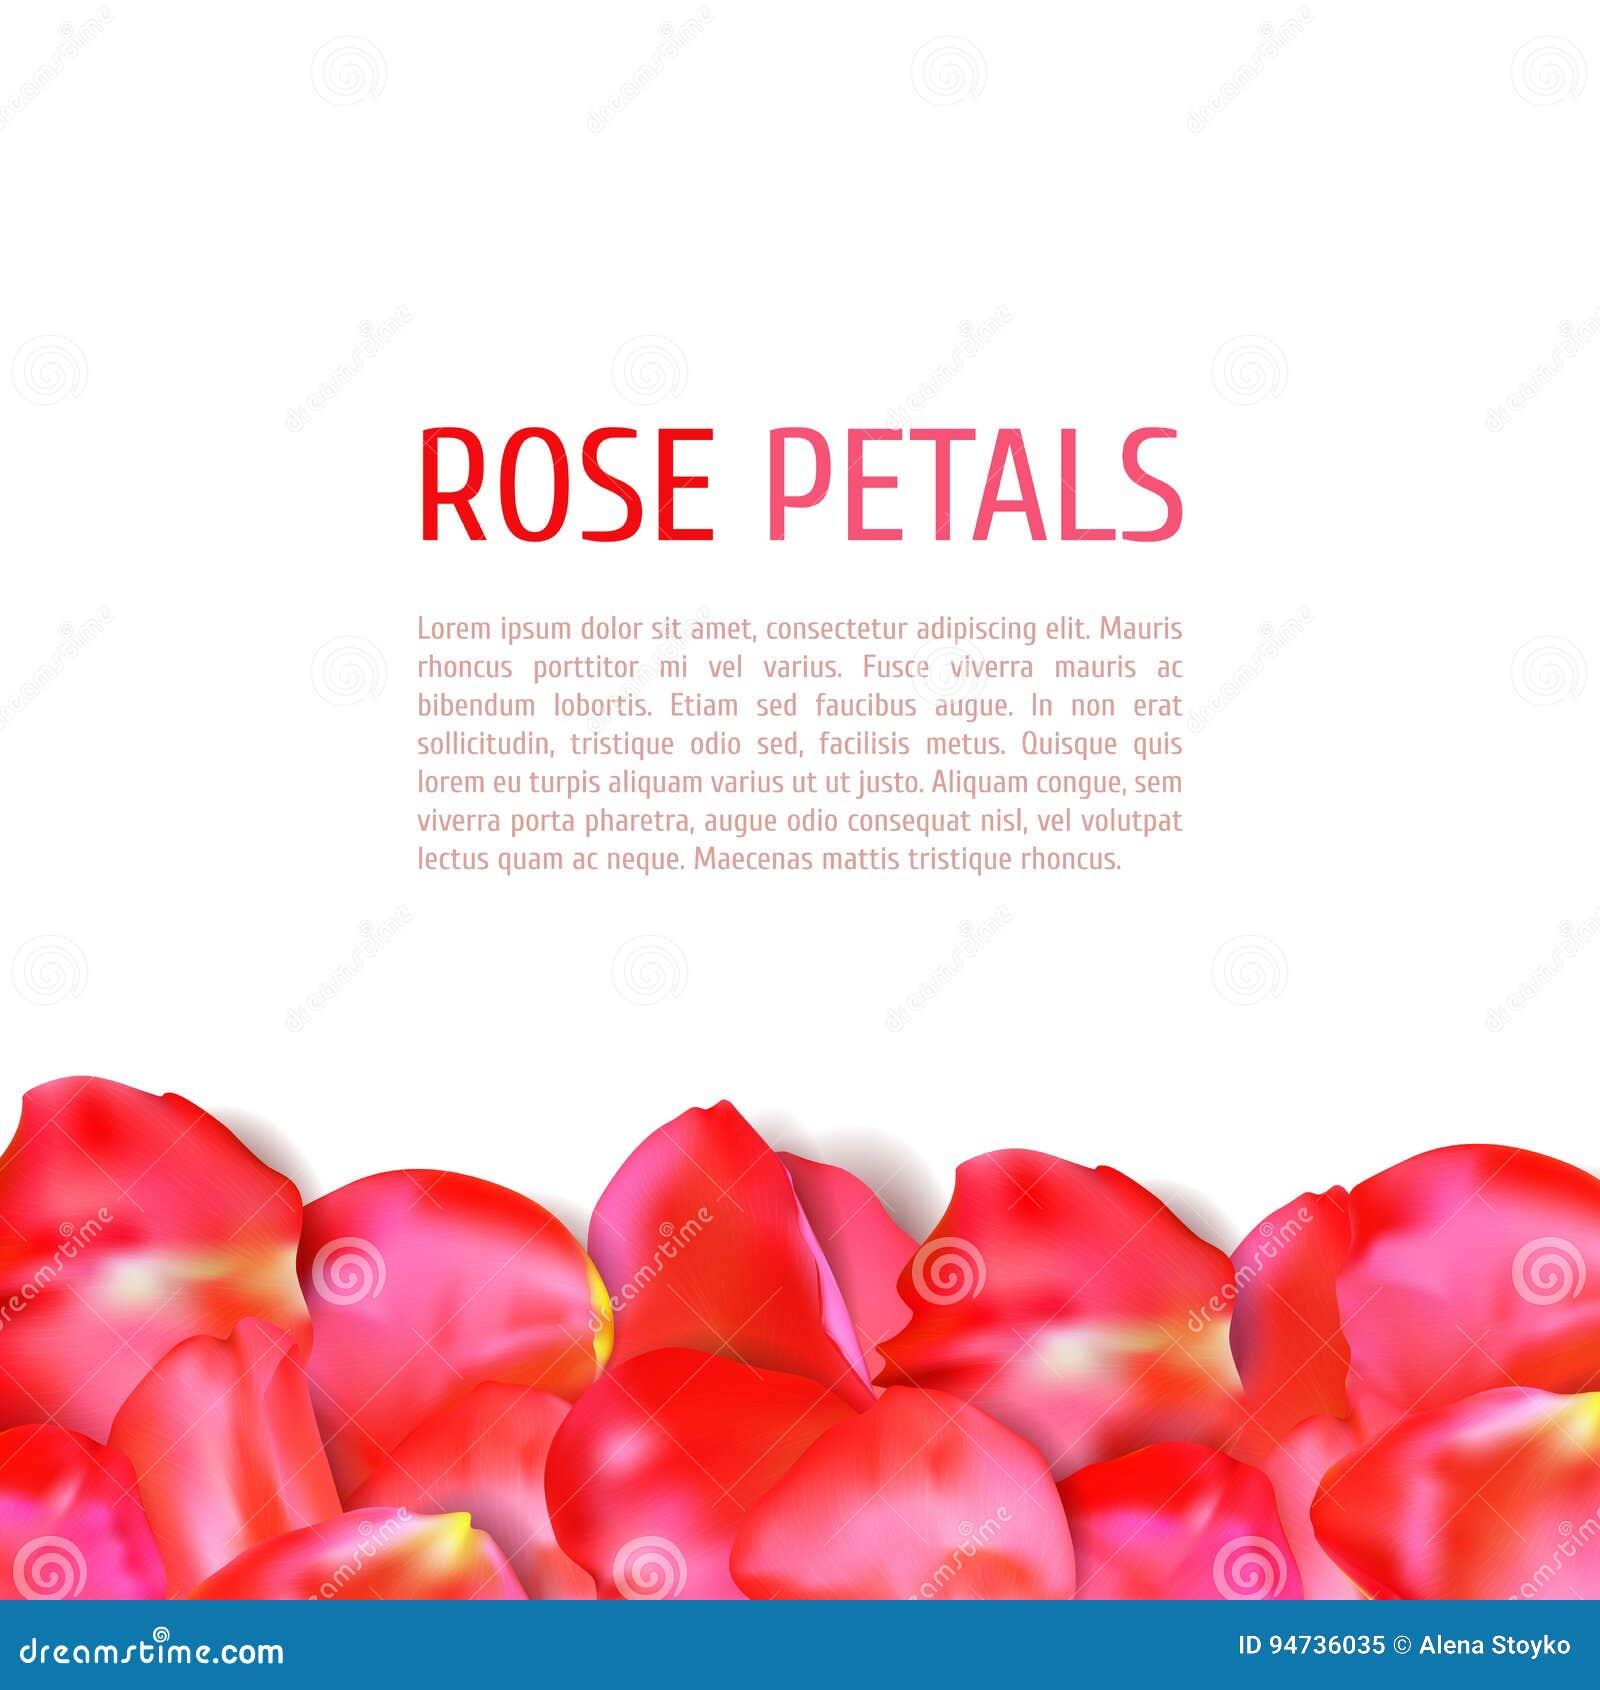 Rose petals border stock vector. Illustration of holiday - 94736035